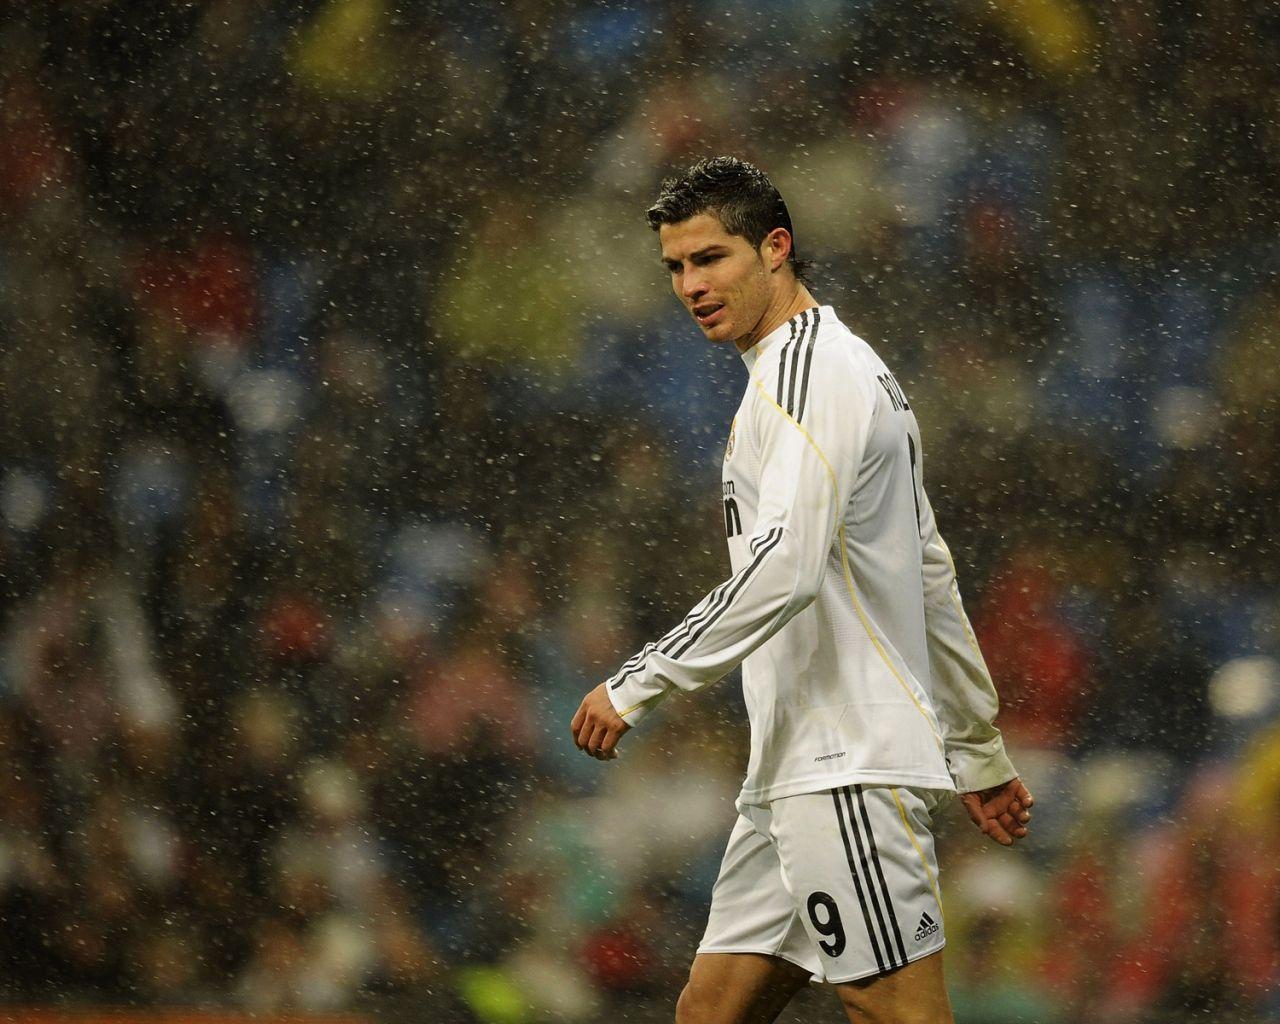 43+] Cristiano Ronaldo Wallpaper 1080p on WallpaperSafari